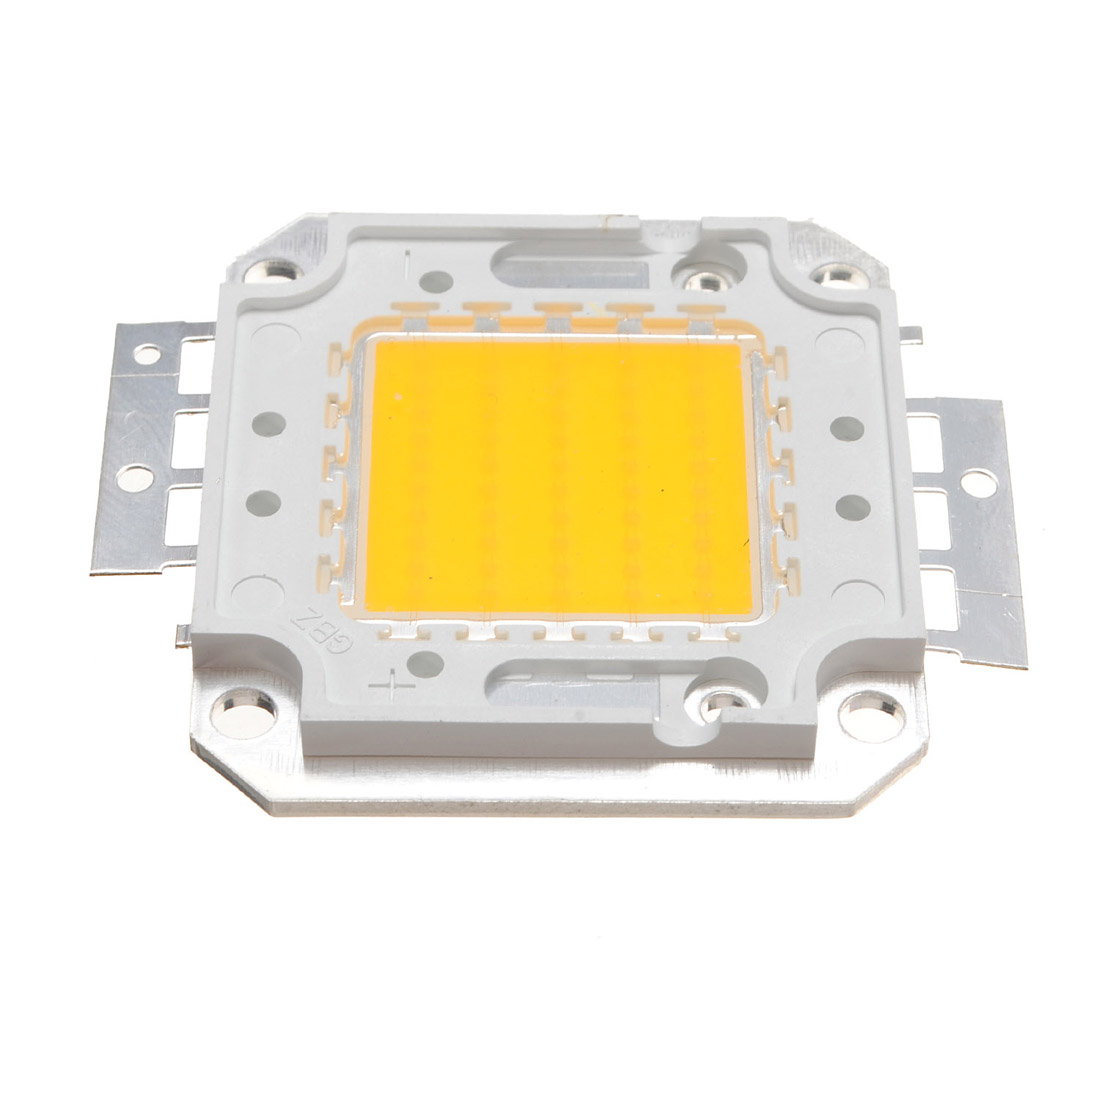 Jiguoor Hot Sale High Power 50W 4000LM Super Bright COB Spot LED Lamp Chips Light Bulb Pure/Warm White 2 Colors